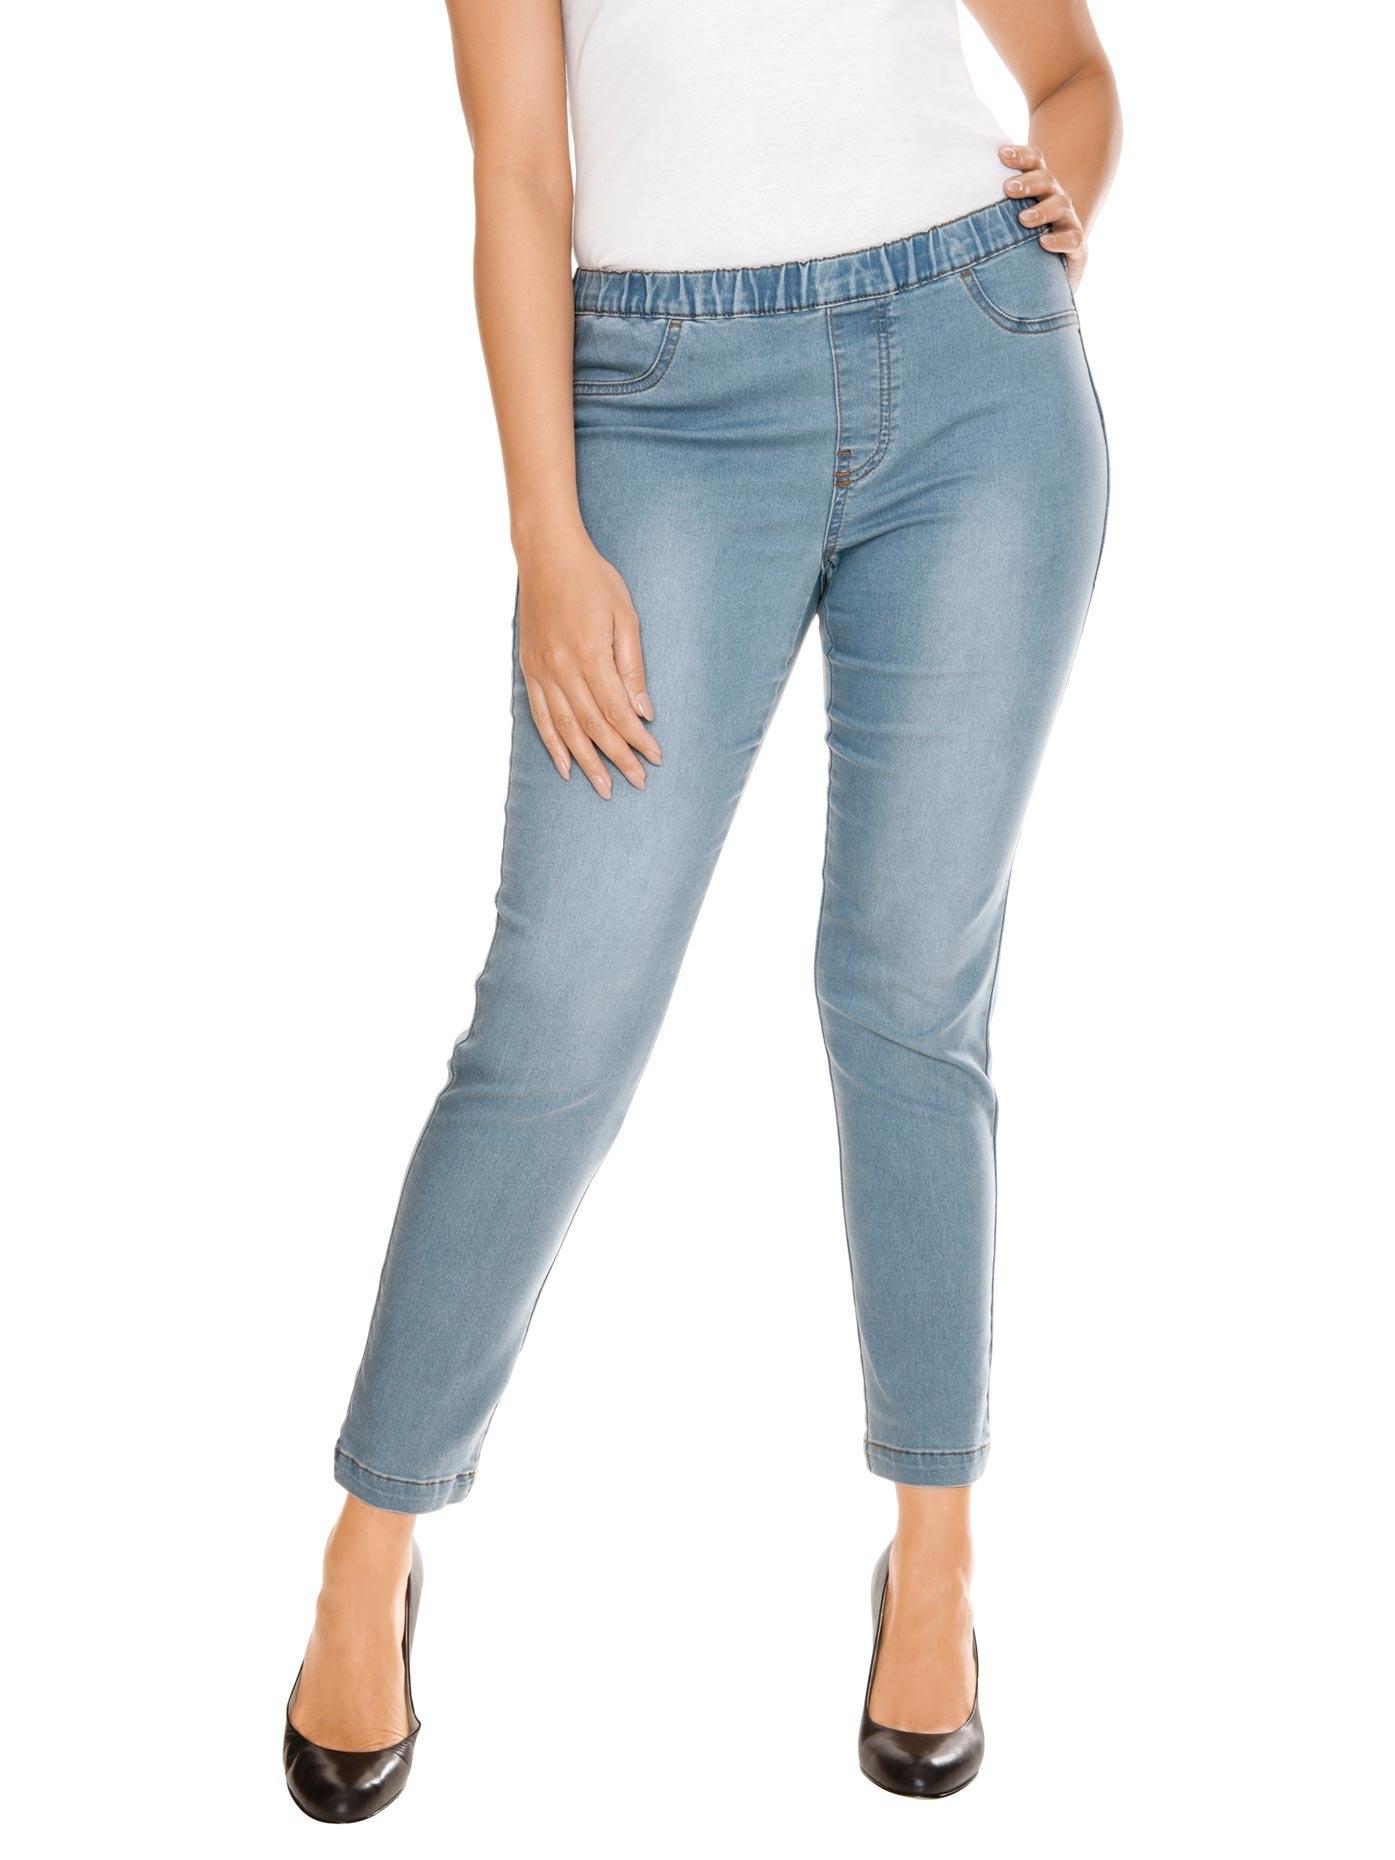 LINEA TESINI by Heine legging in jeans-look bestellen: 30 dagen bedenktijd